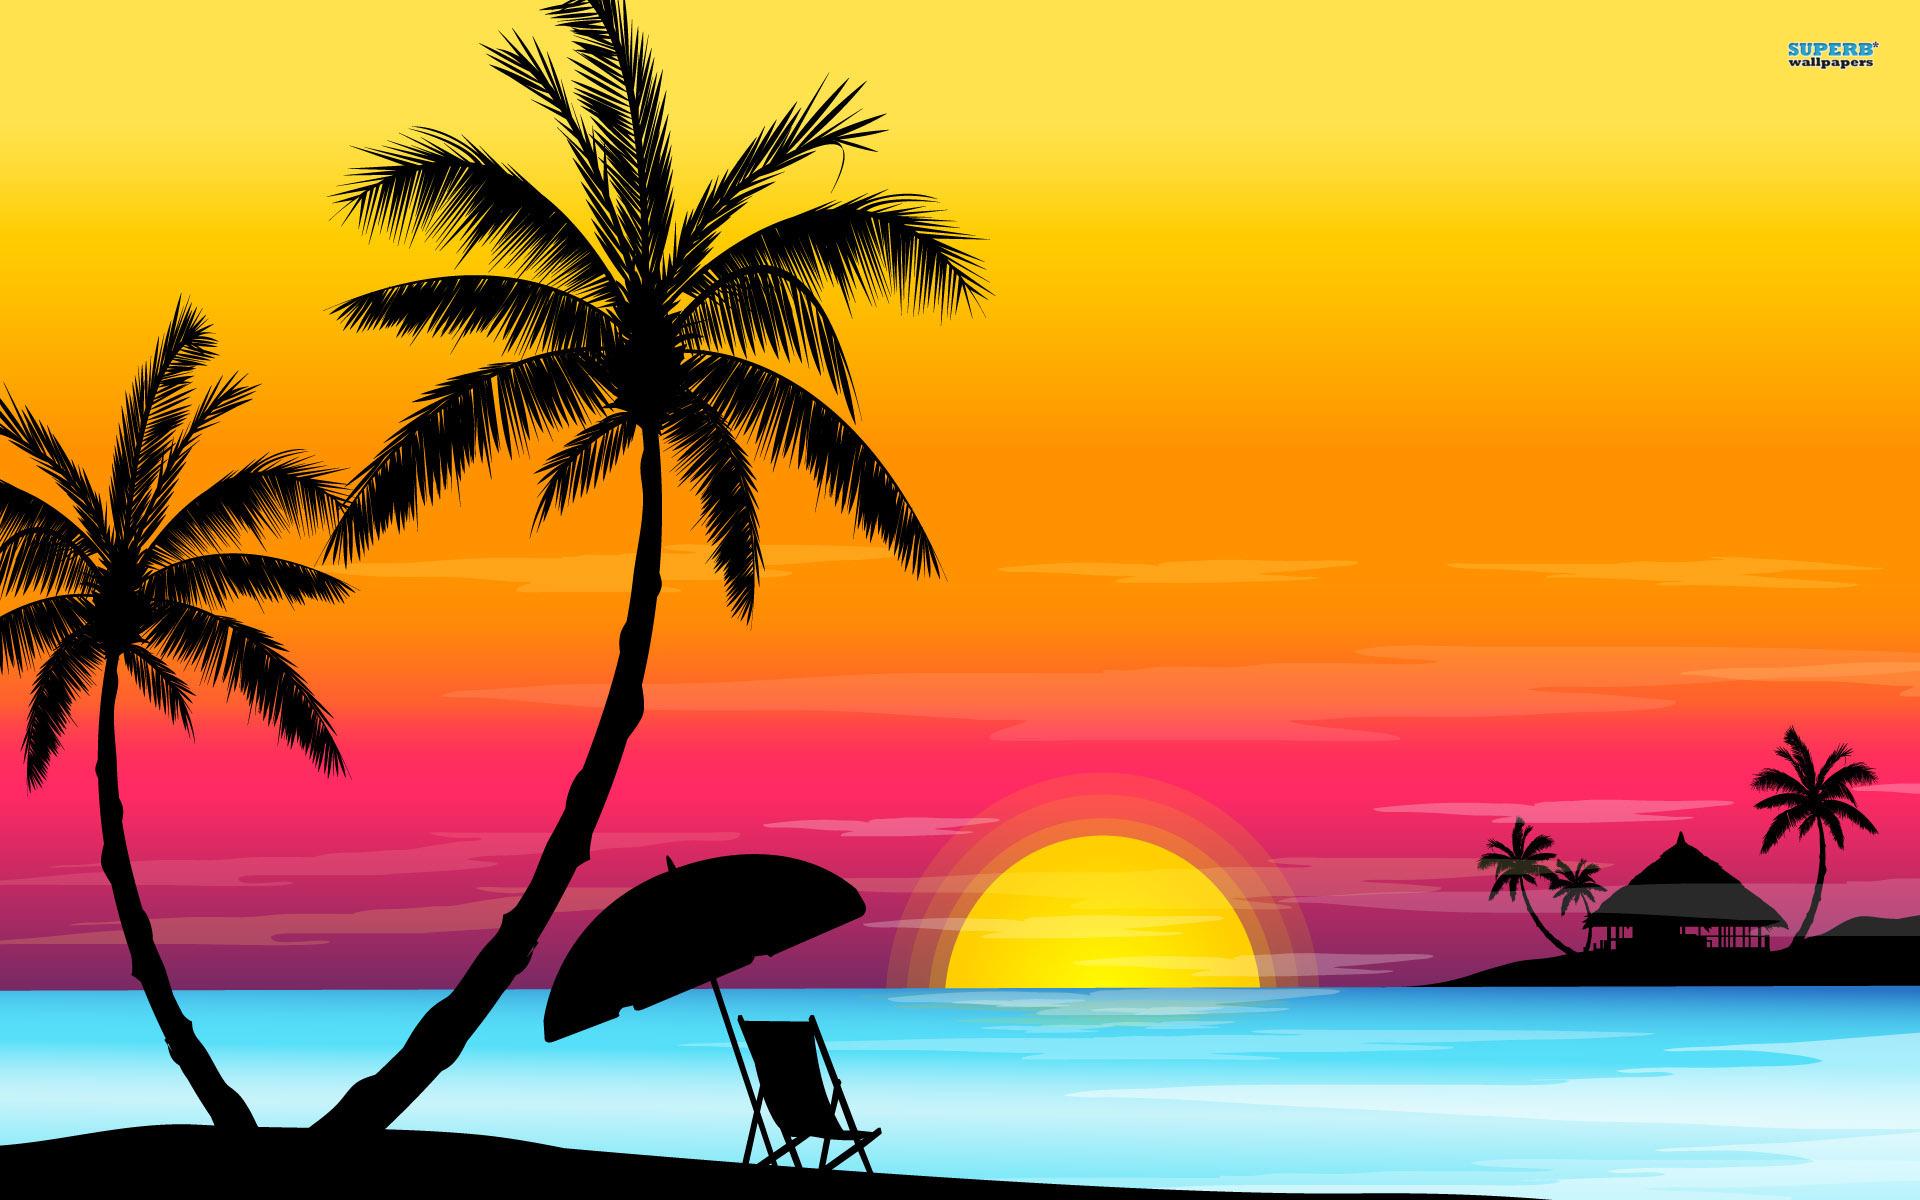 Sunset Clipart.